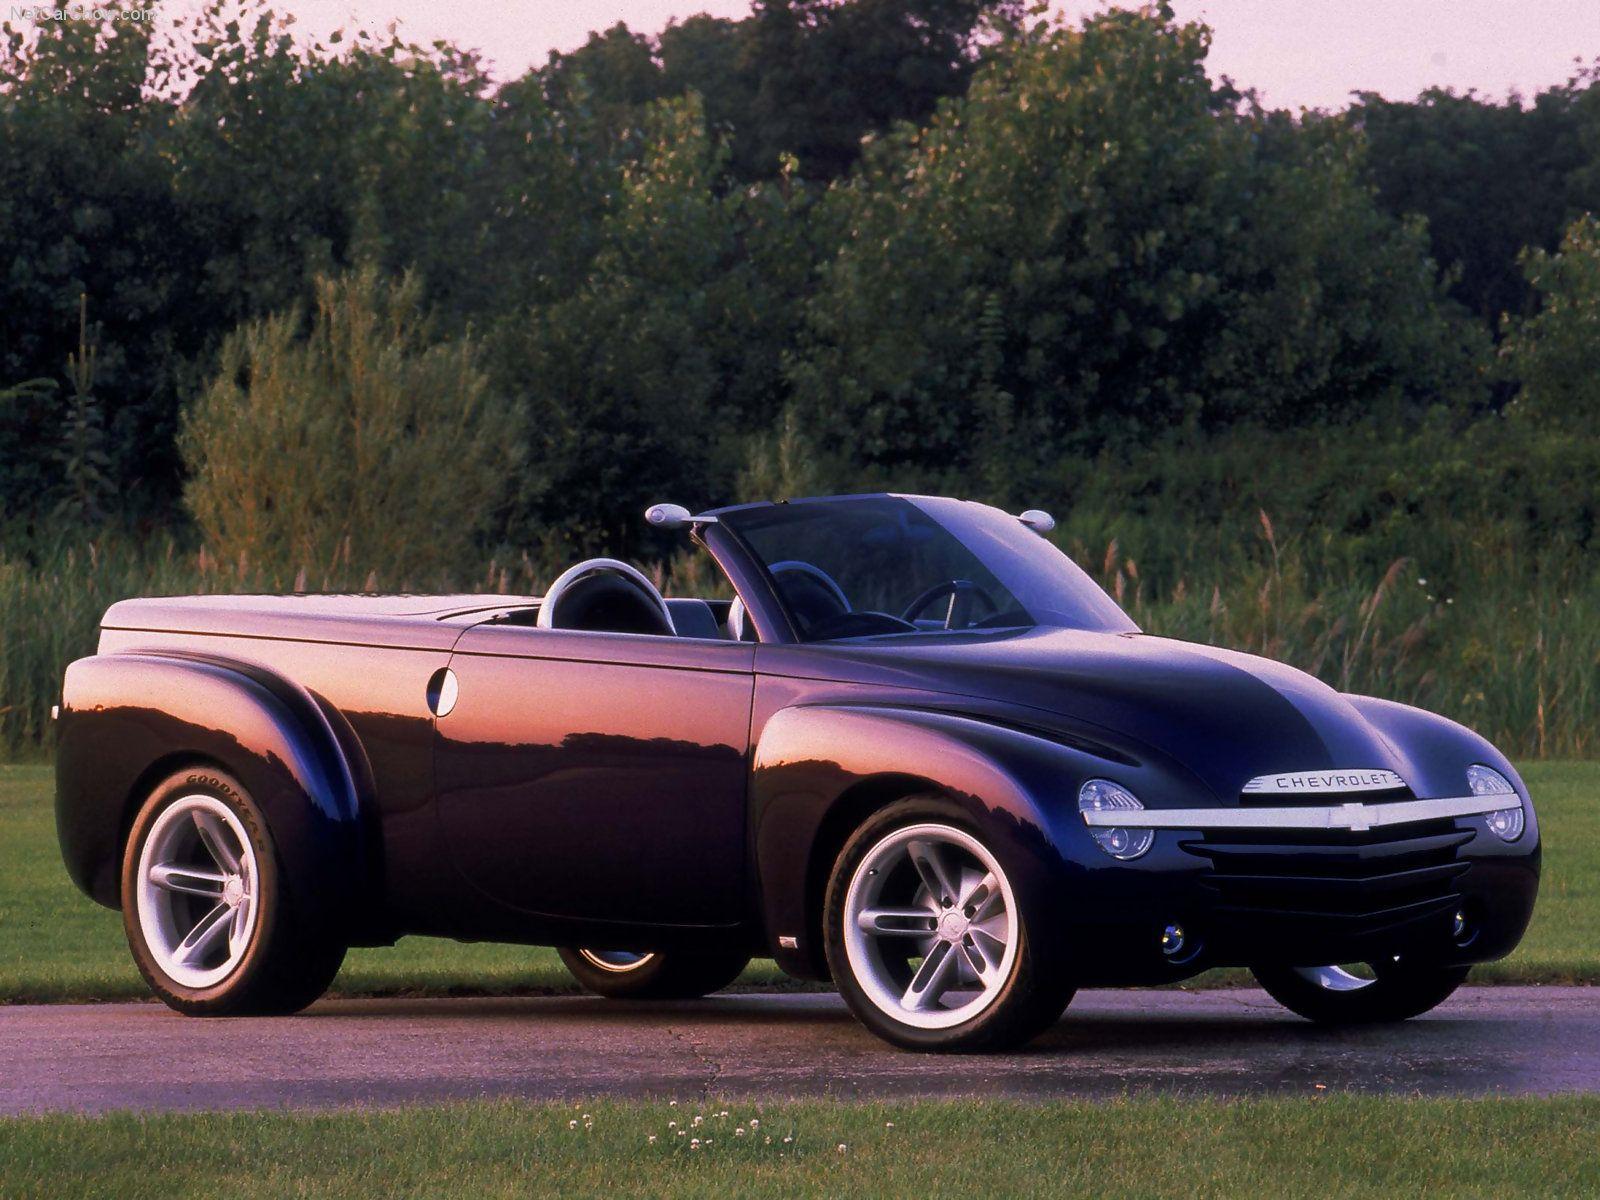 2006 Chevrolet Ssr Chevrolet Ssr Chevy Ssr Chevrolet